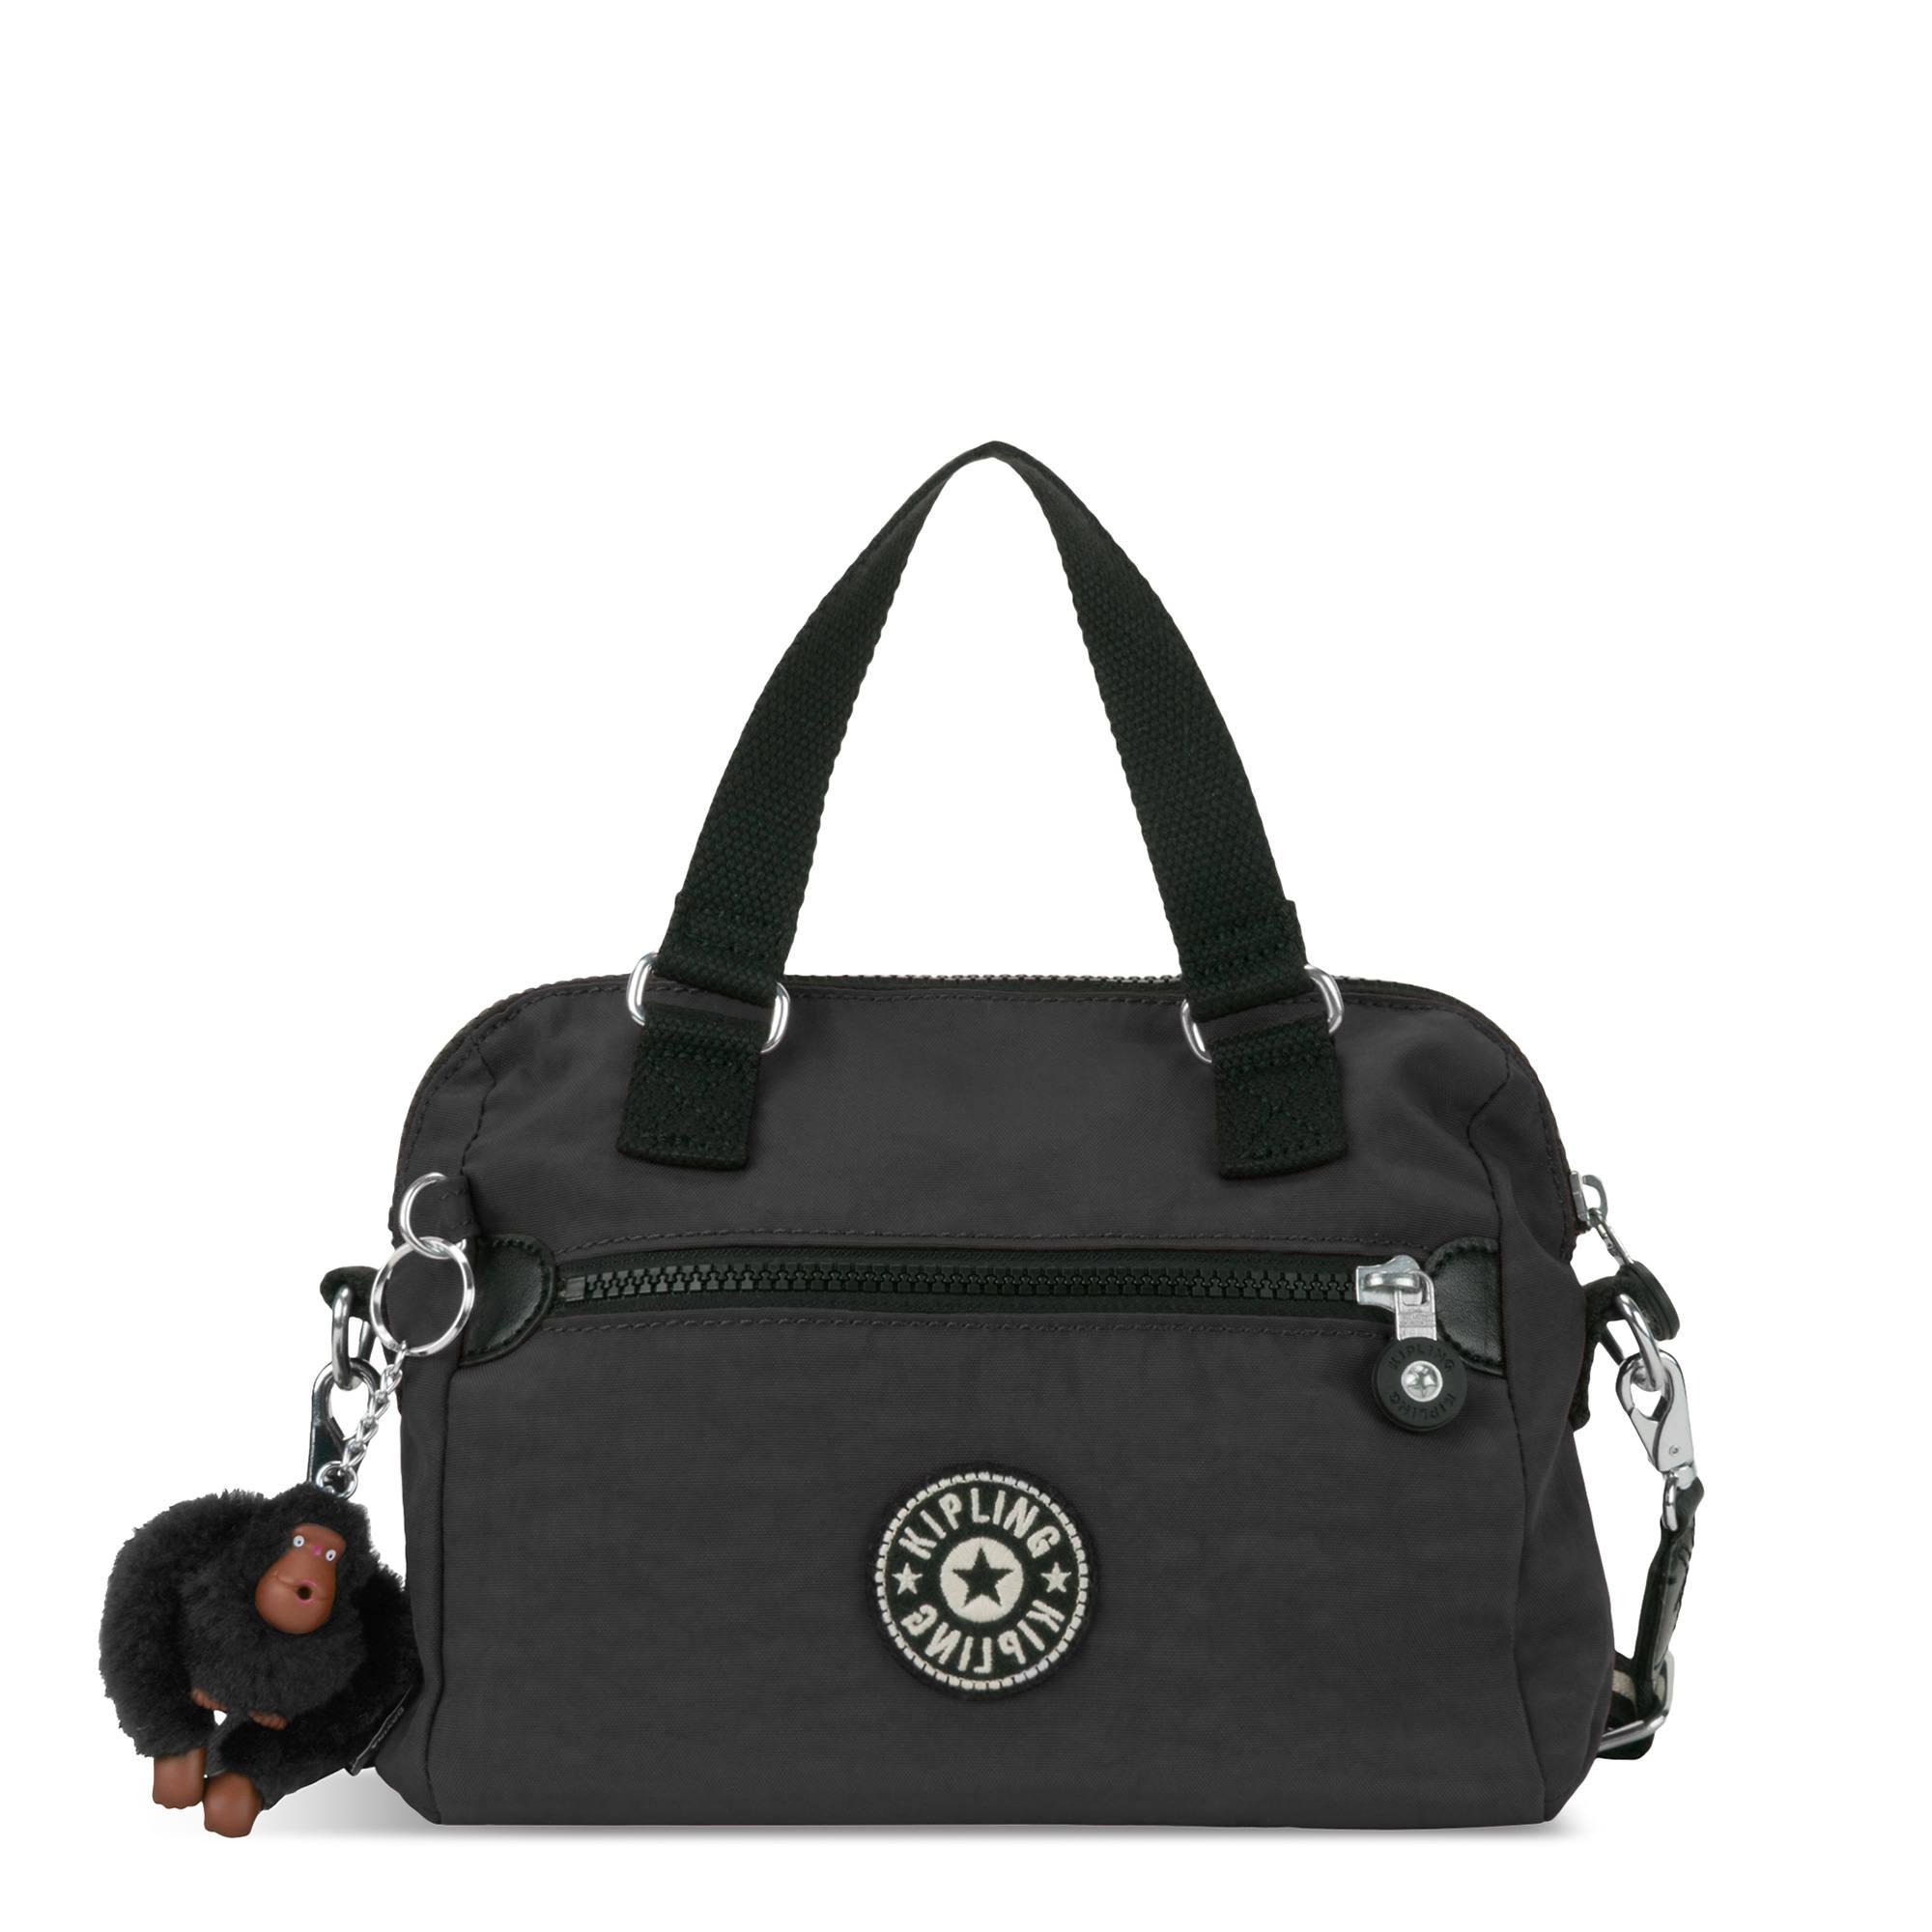 Amazon Kipling Handbags Handbags 2019